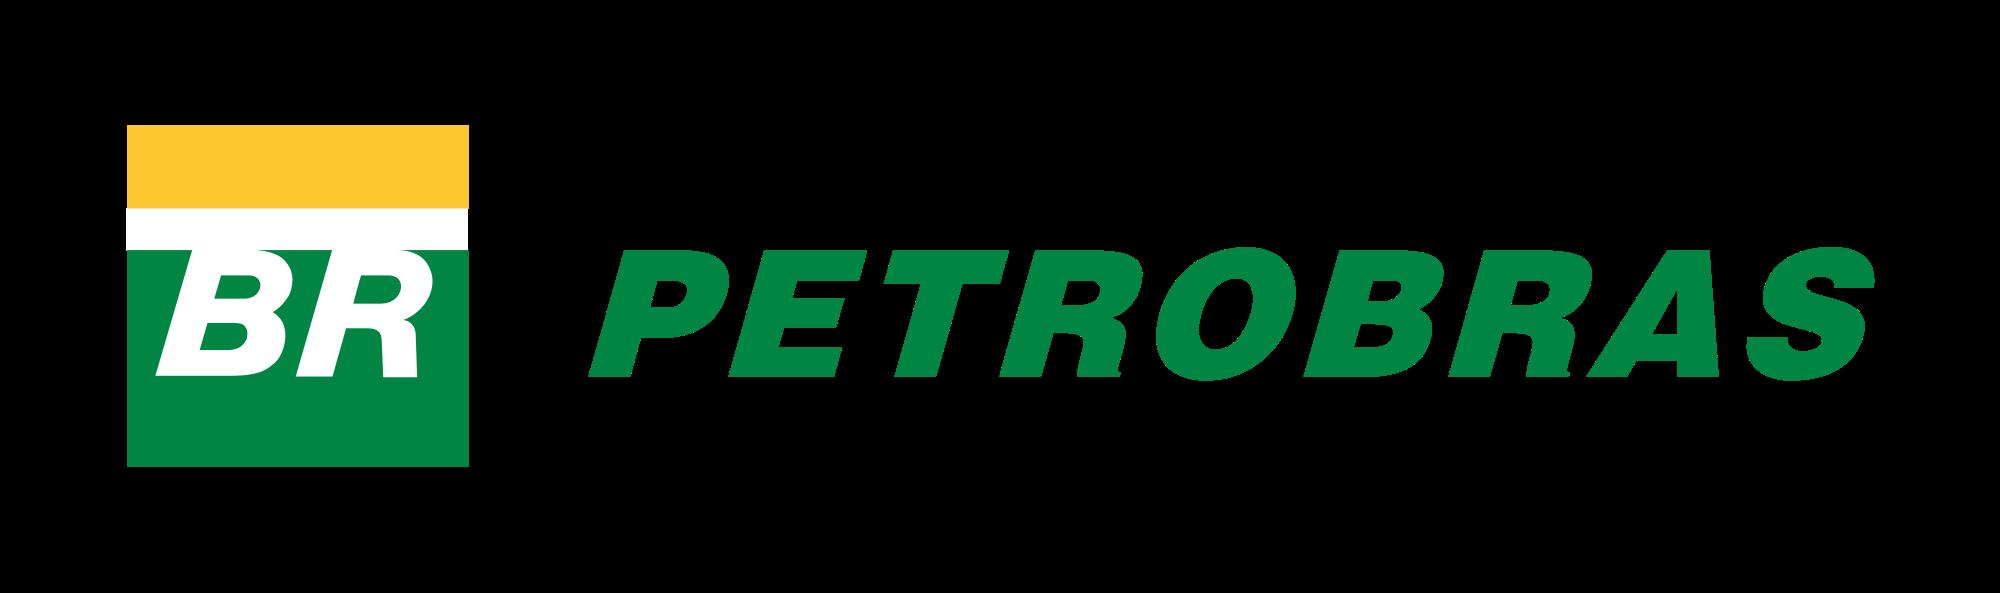 Petrobras PNG - 34727